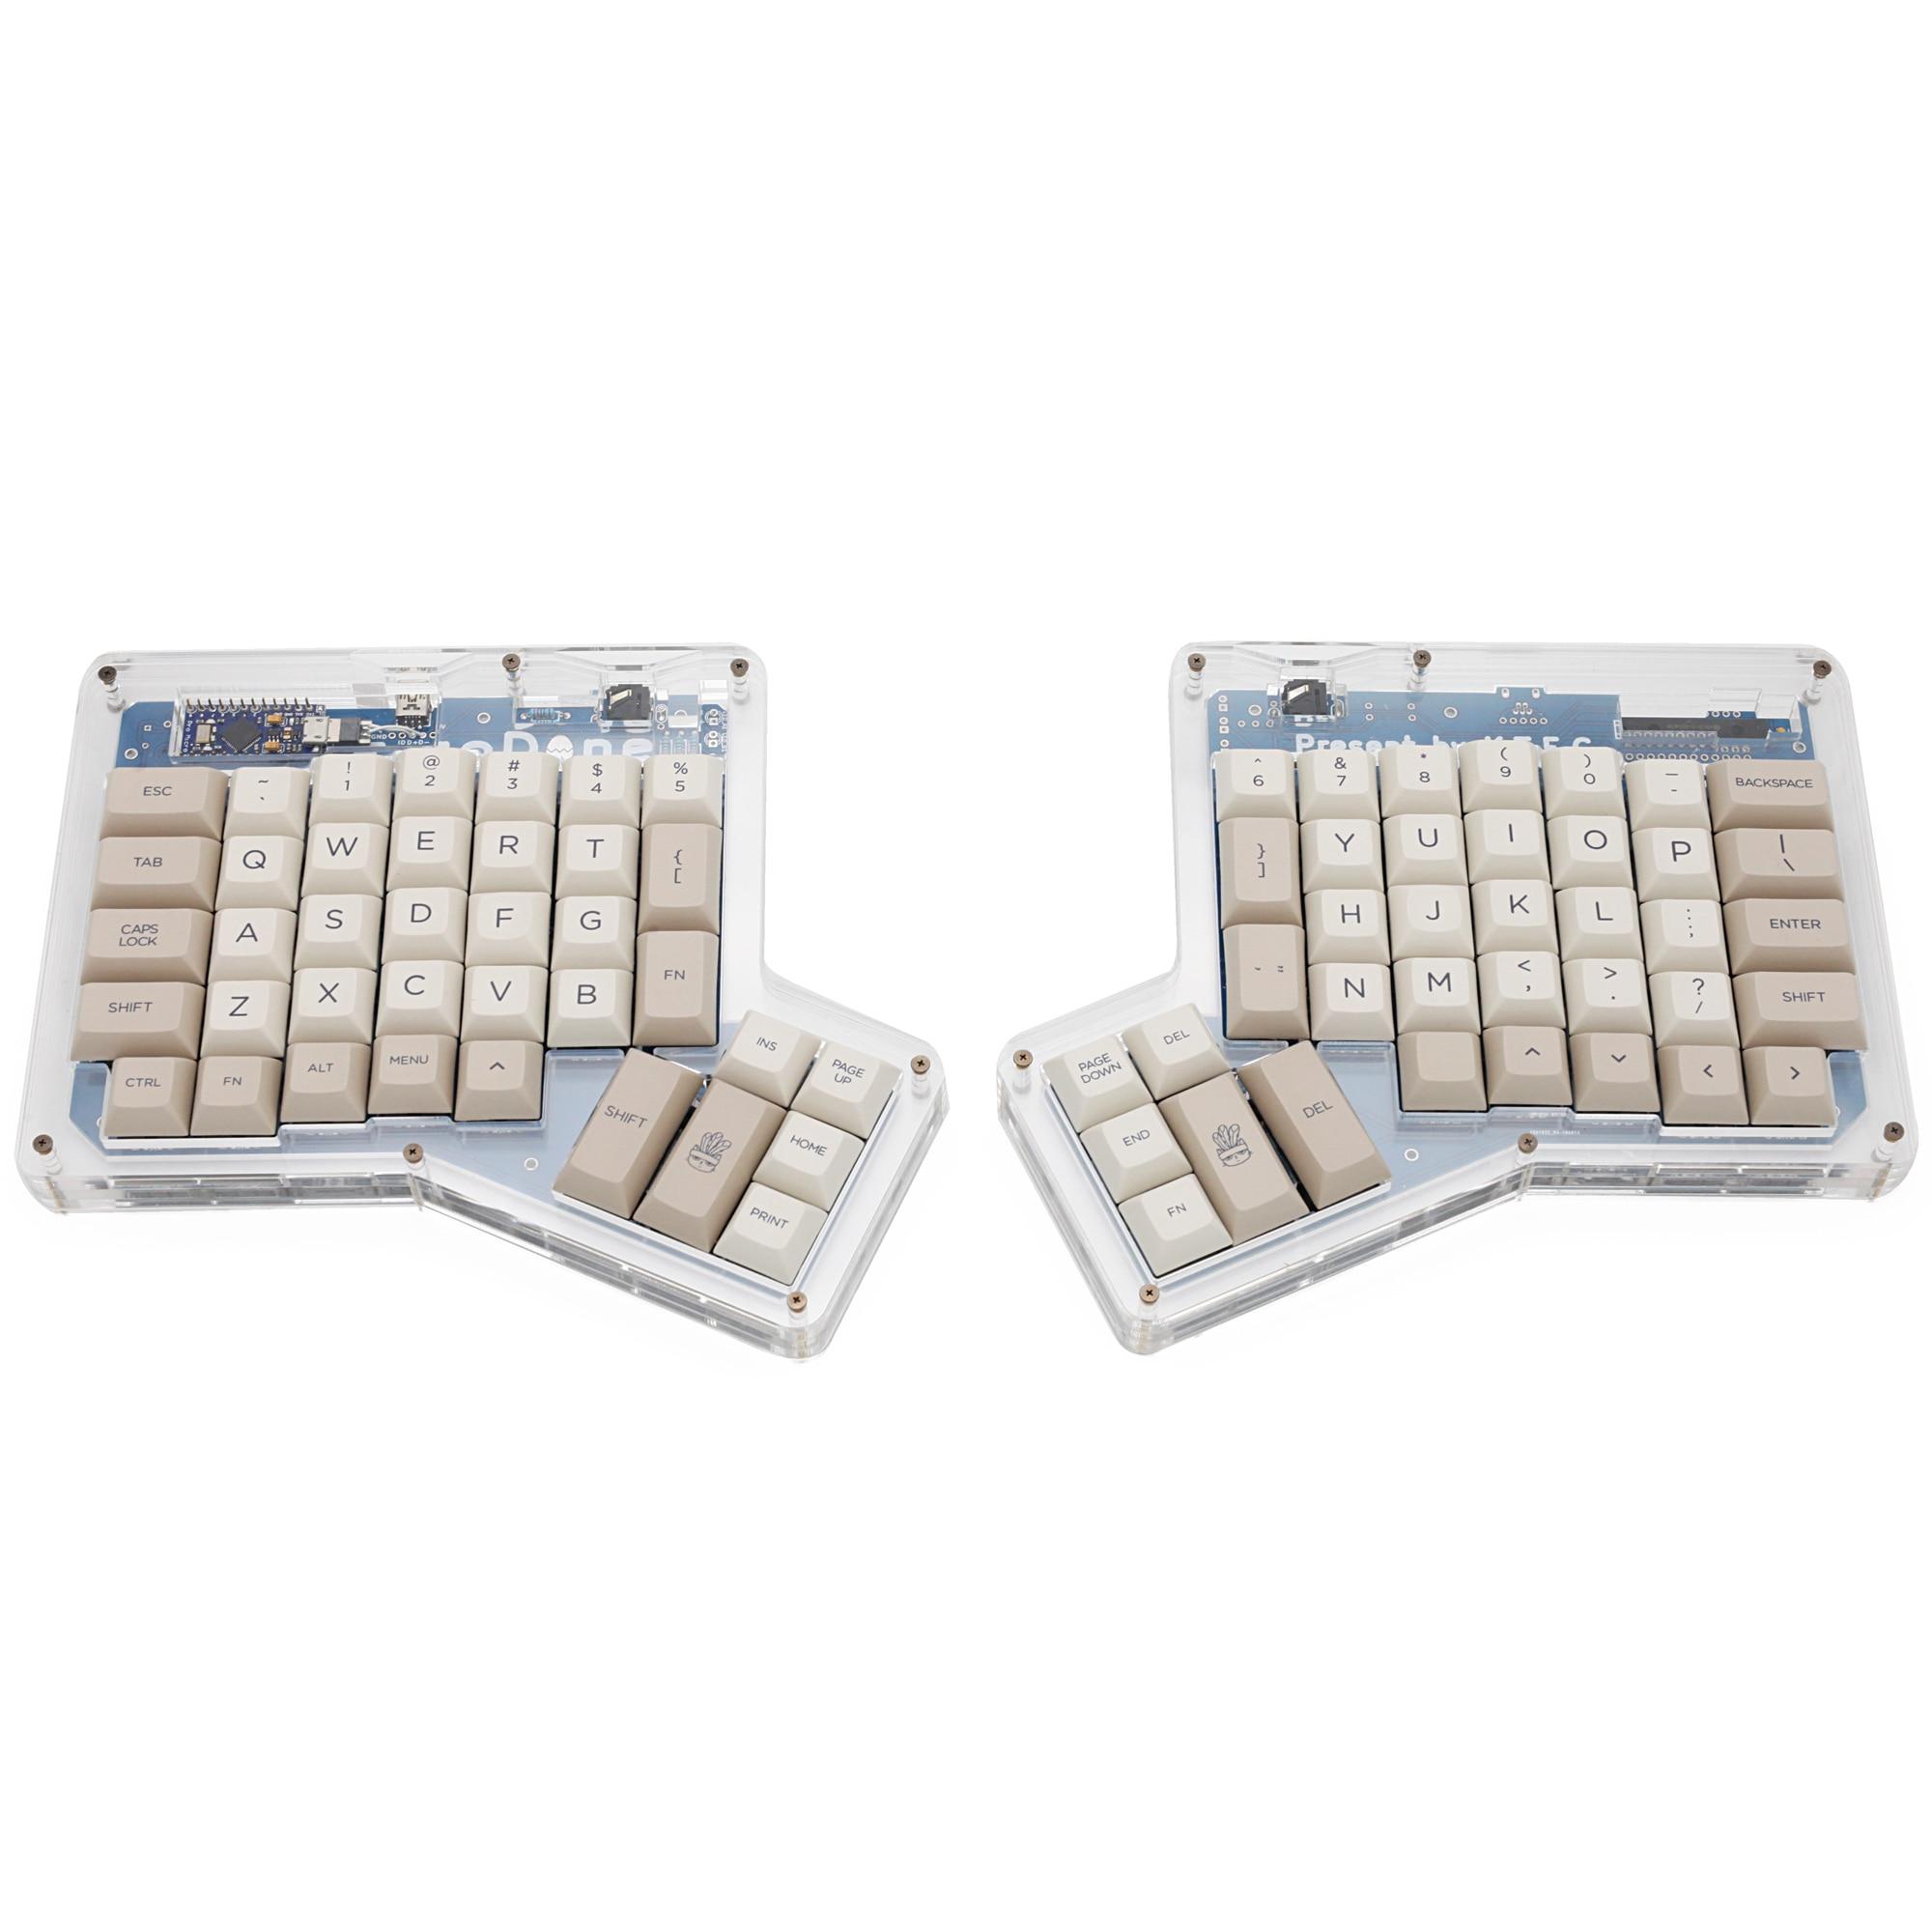 Teclas do Teclado Ergodox Ergo Substituiu Keycaps Teclados Mecânicos Personalizado Infinito Ergonômico Bege Claro Cinza Dsa Pbt Dye